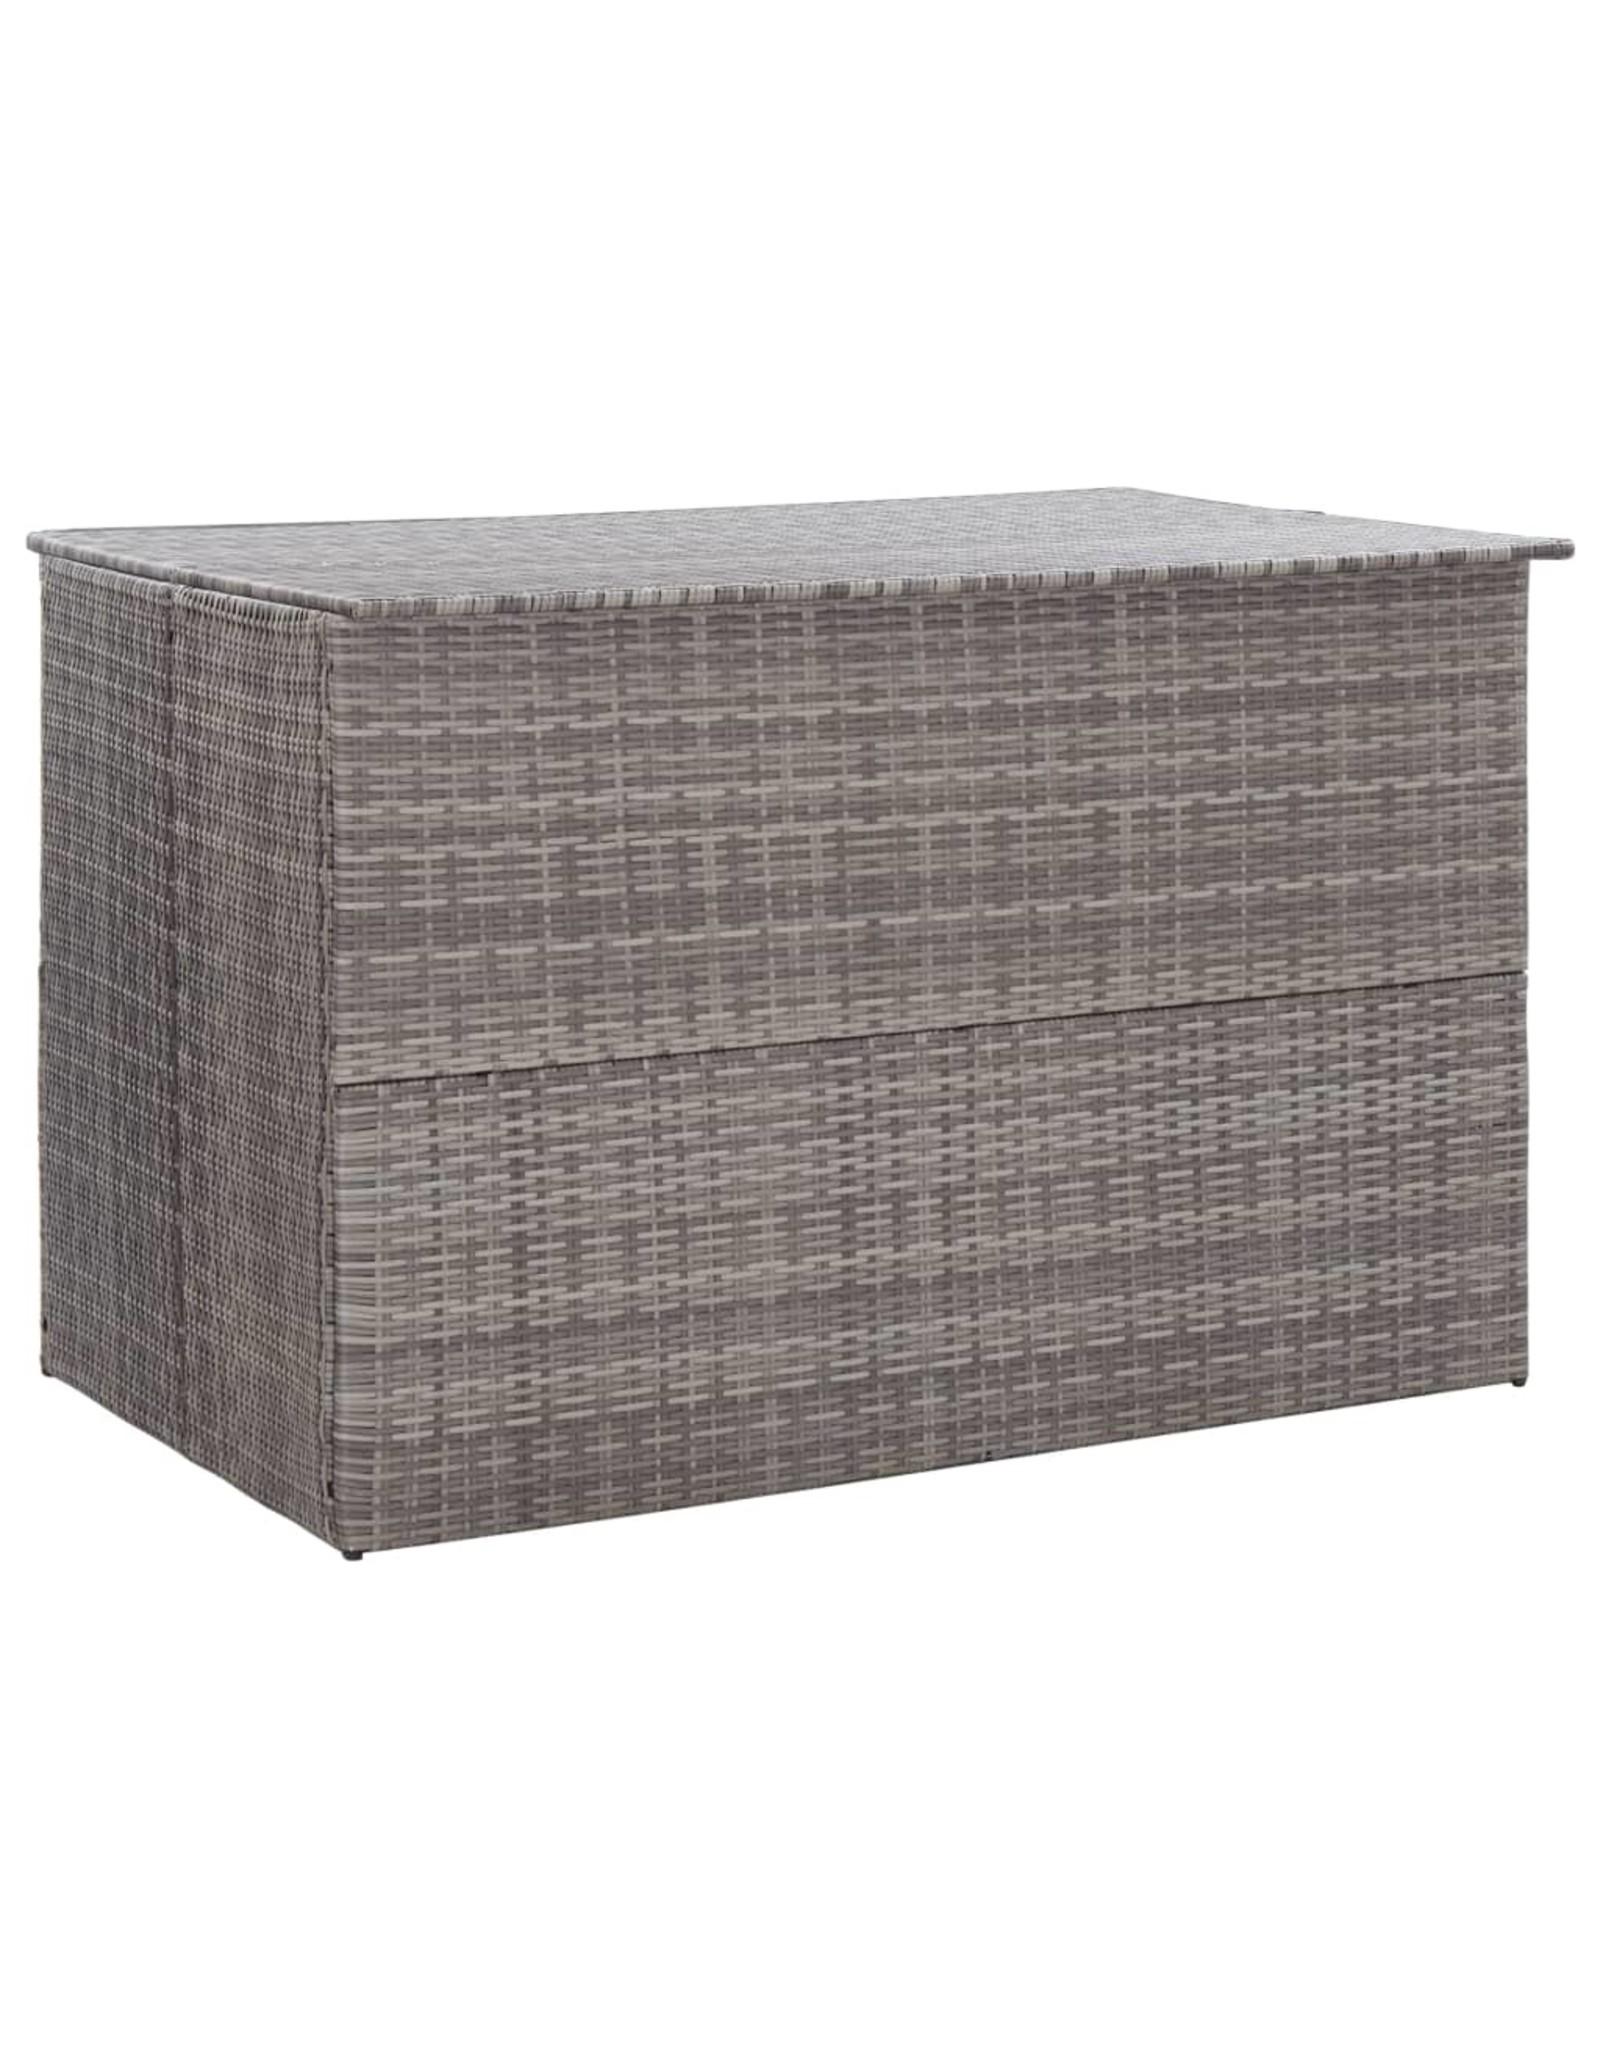 Tuinbox 150x100x100 cm poly rattan grijs